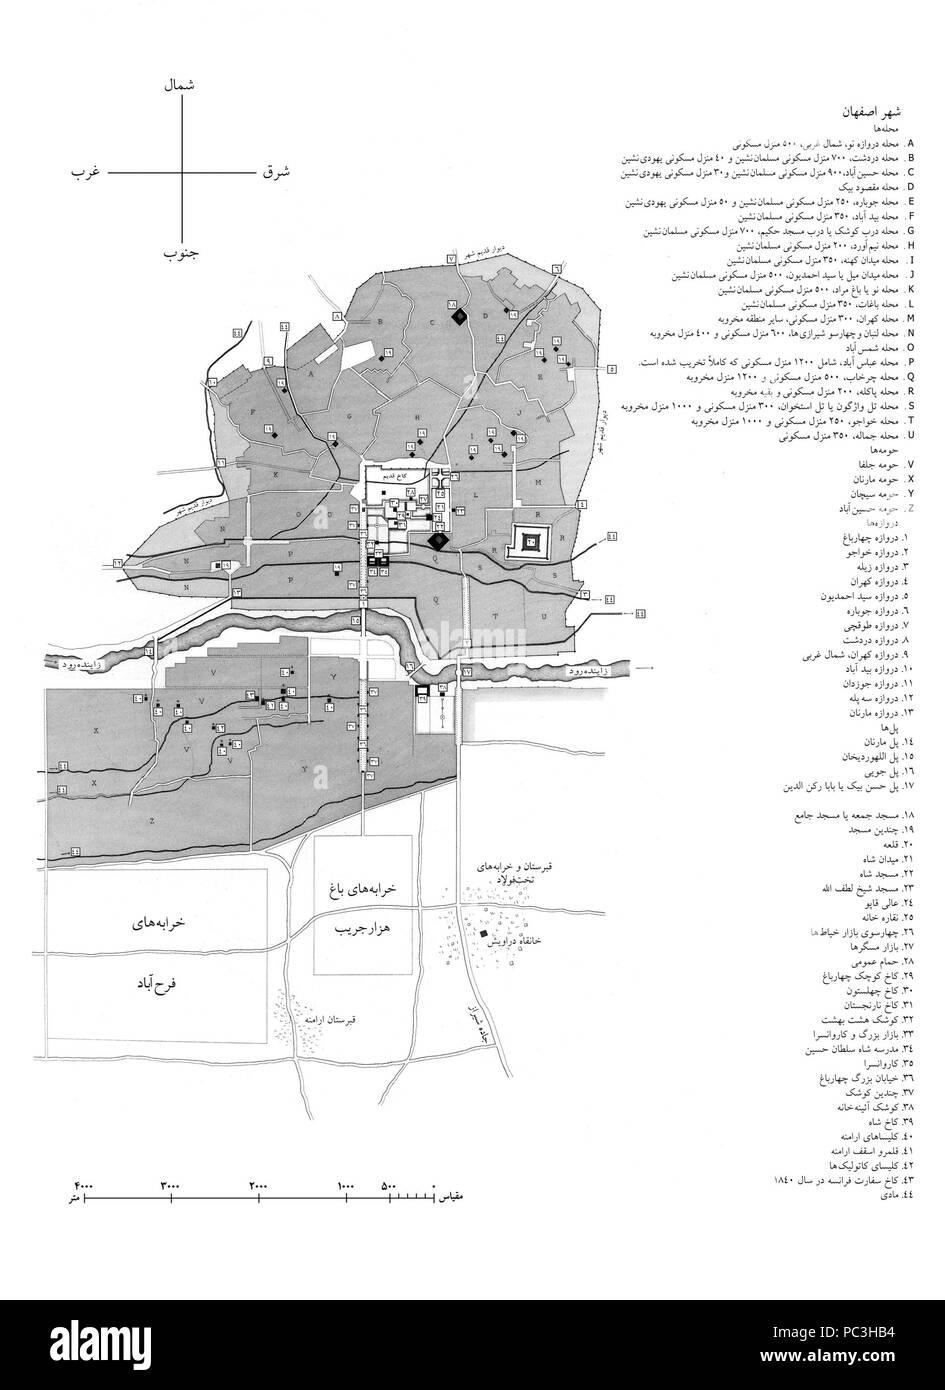 2 19th century map of isfahan Stock Photo: 213979784 - Alamy